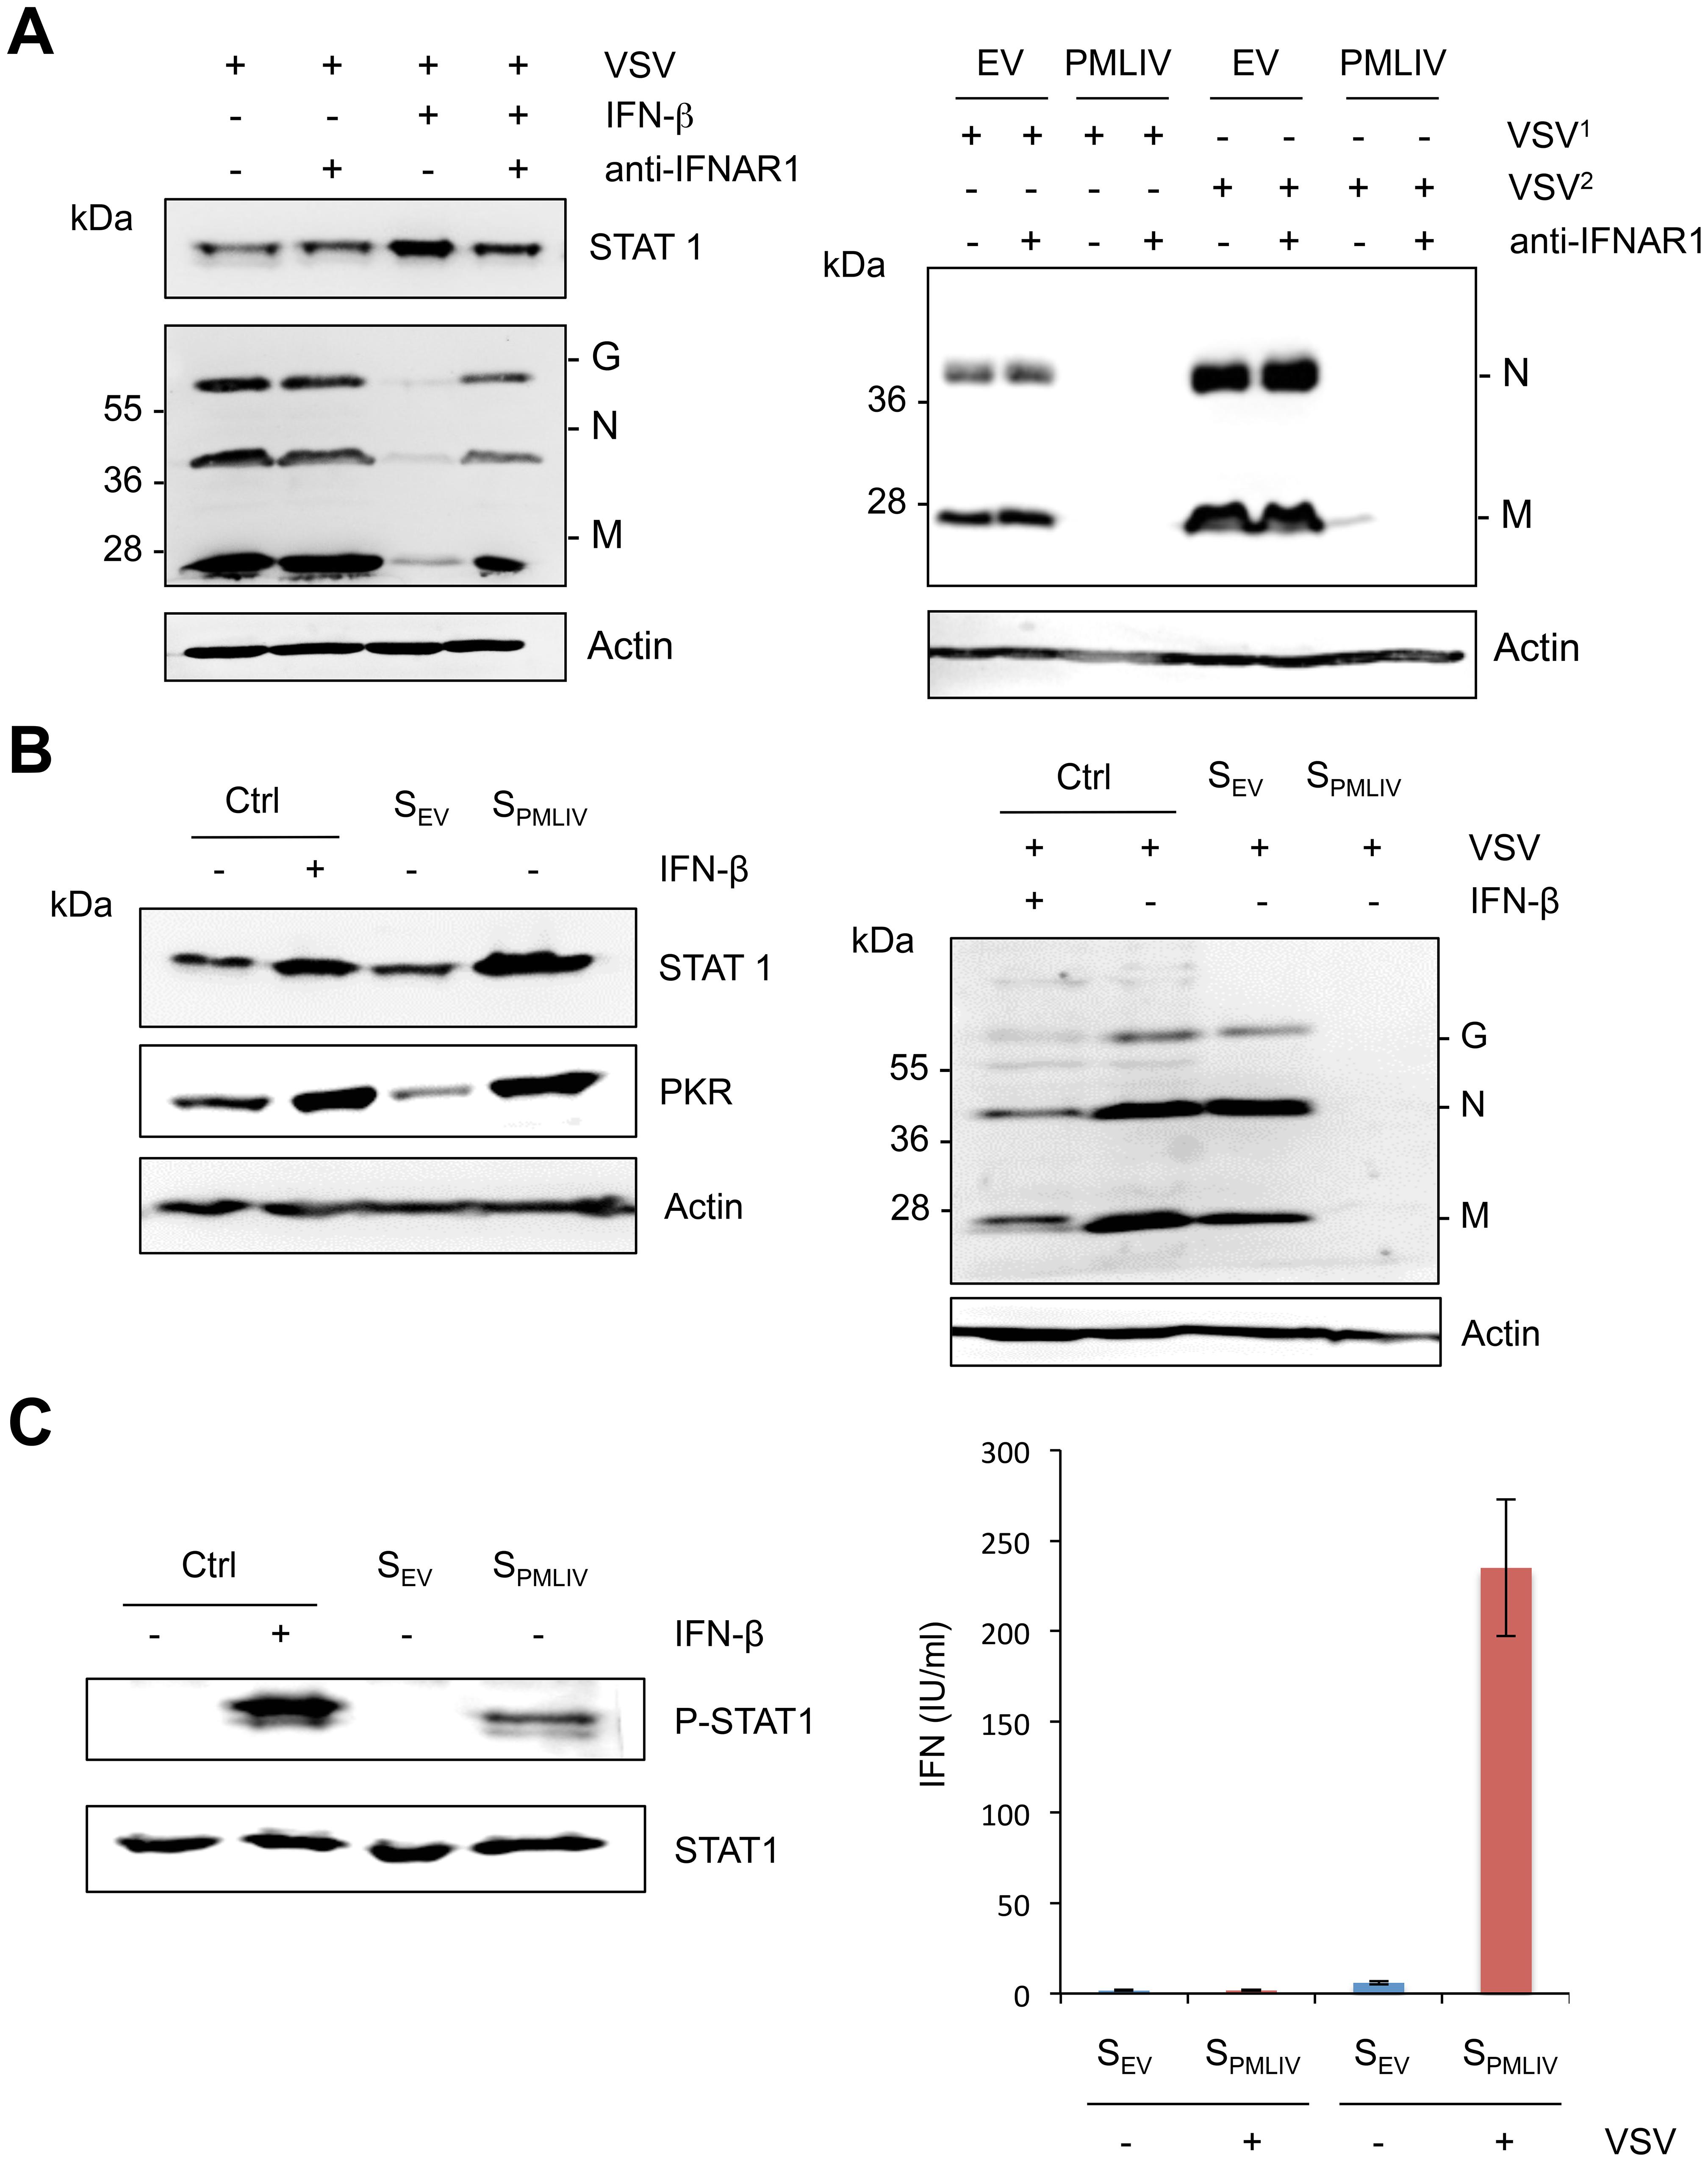 Intrinsic and innate immune properties of PMLIV.